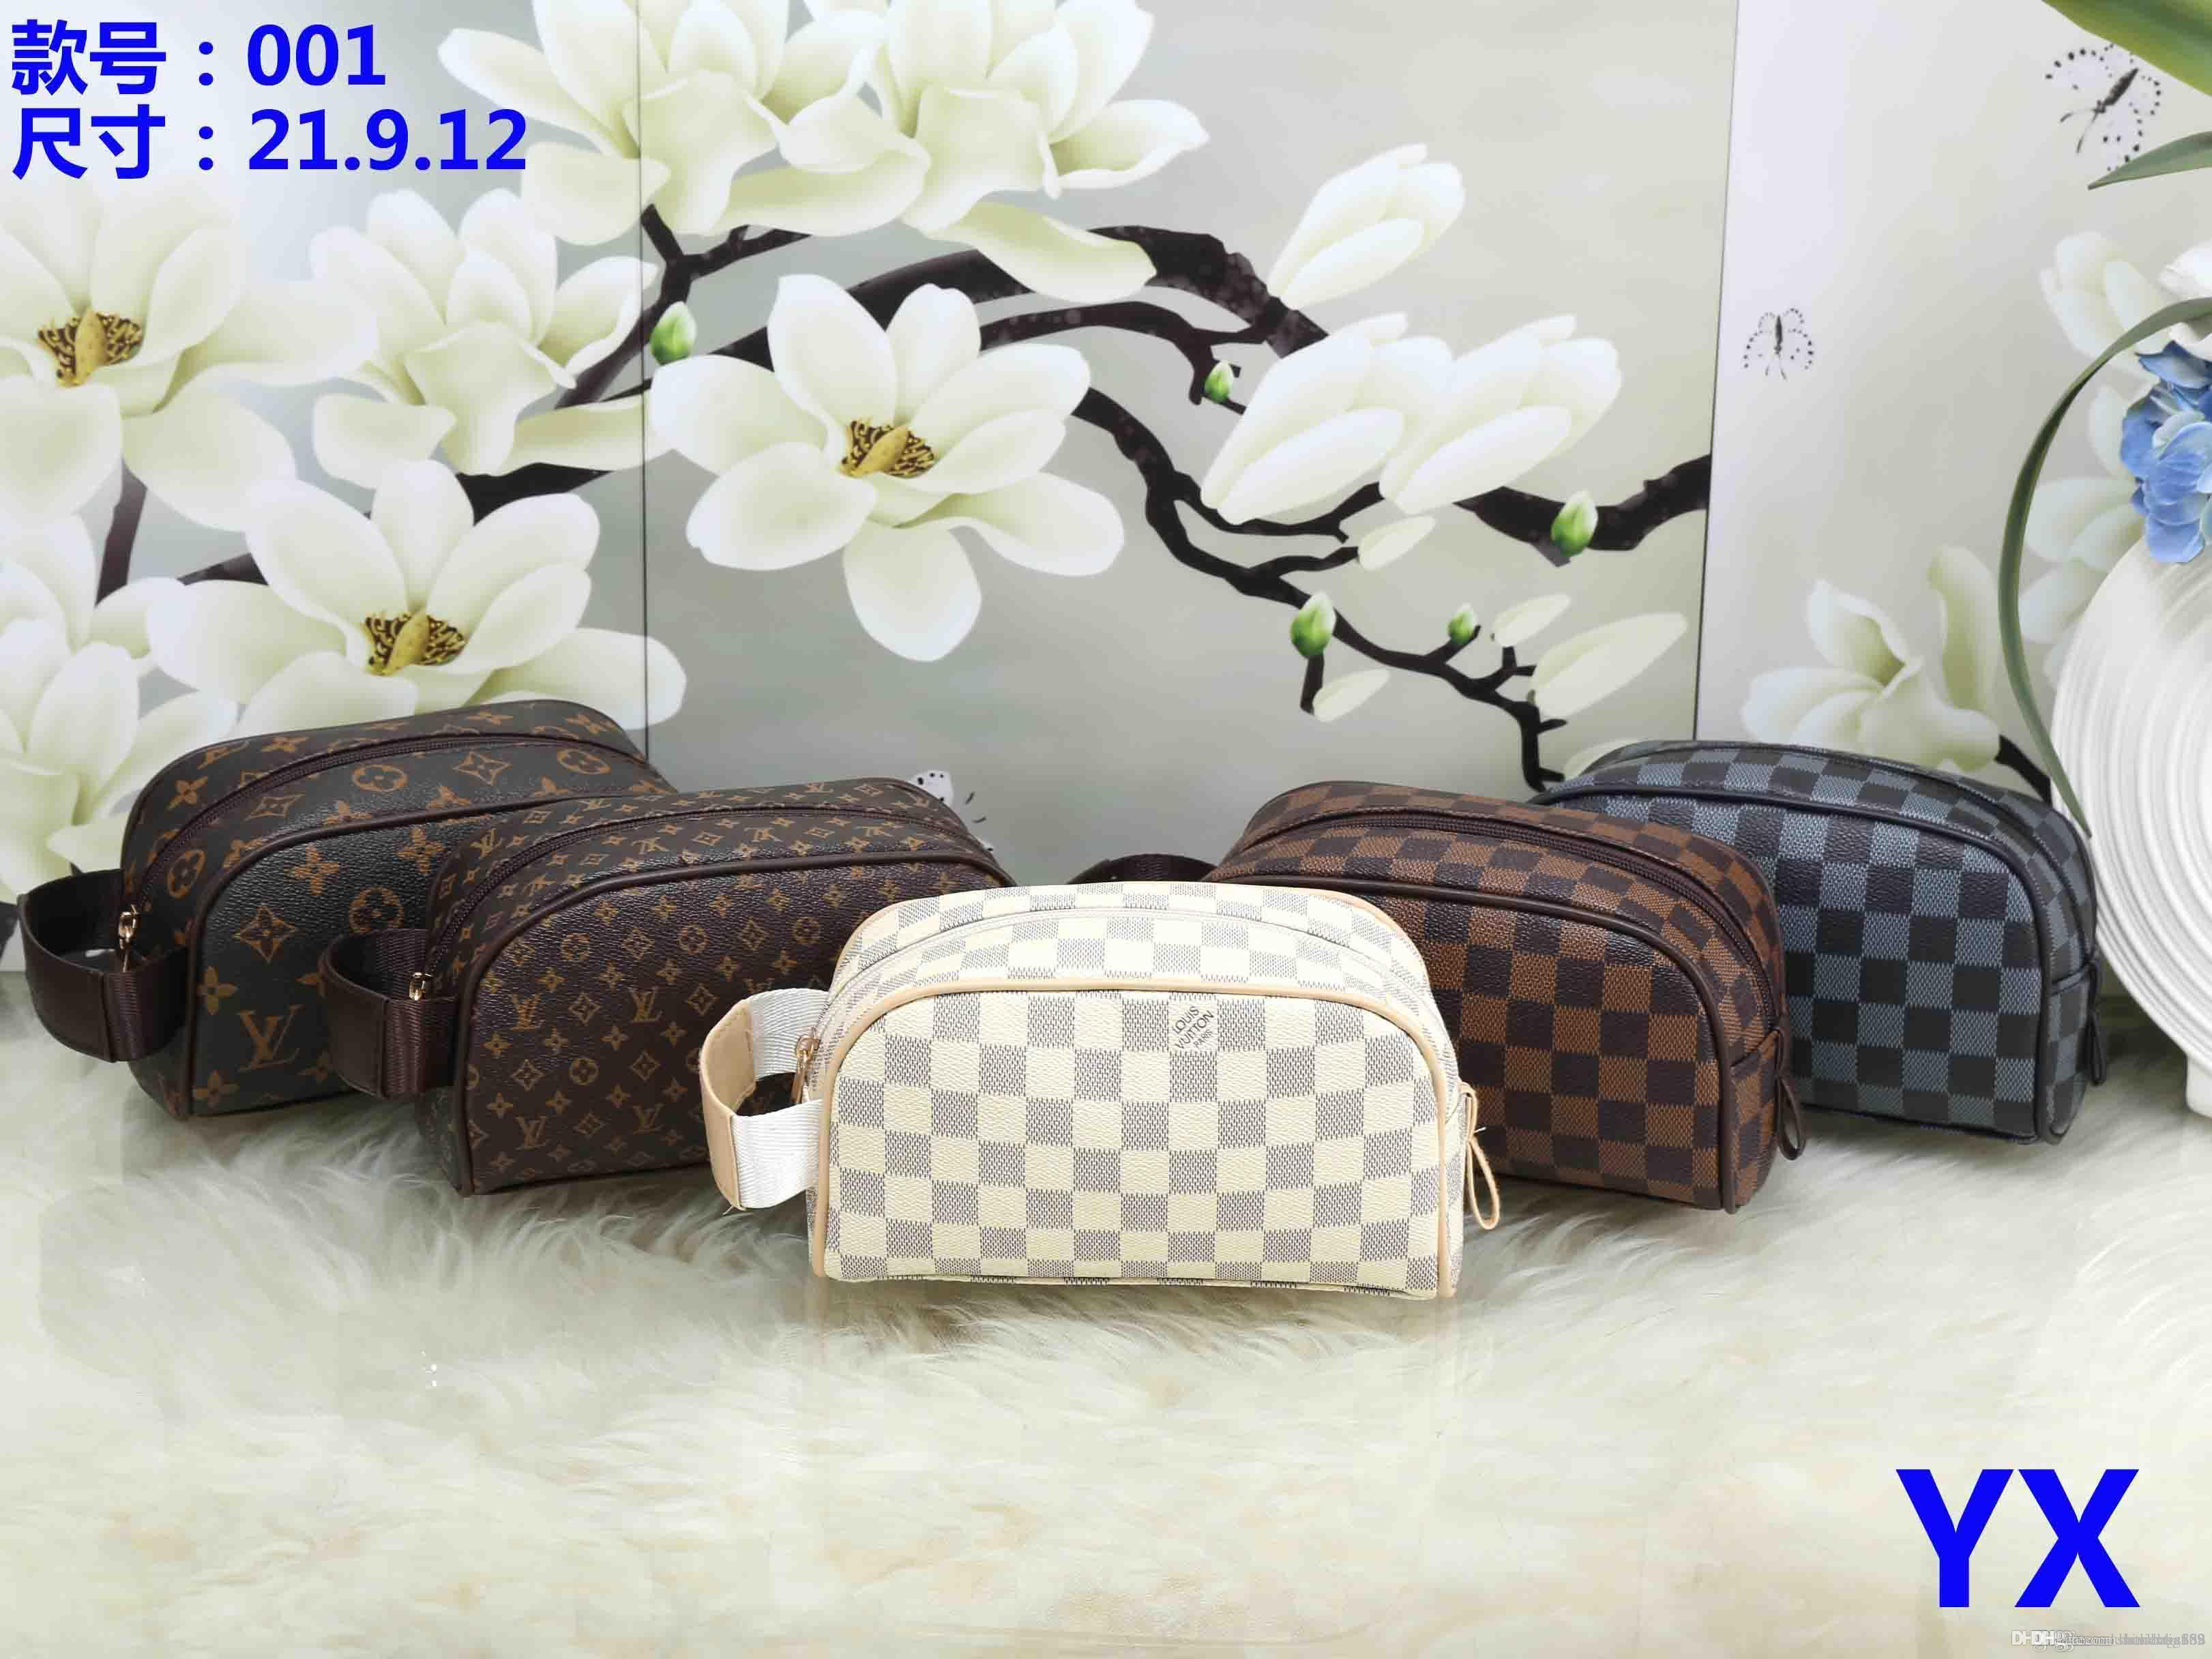 883537110f22 2019 MK 001 LL NEW Styles Fashion Bags Ladies Handbags Designer Bags Women  Tote Bag Luxury Brands Bags Single Shoulder Bag From Shixiaohan02